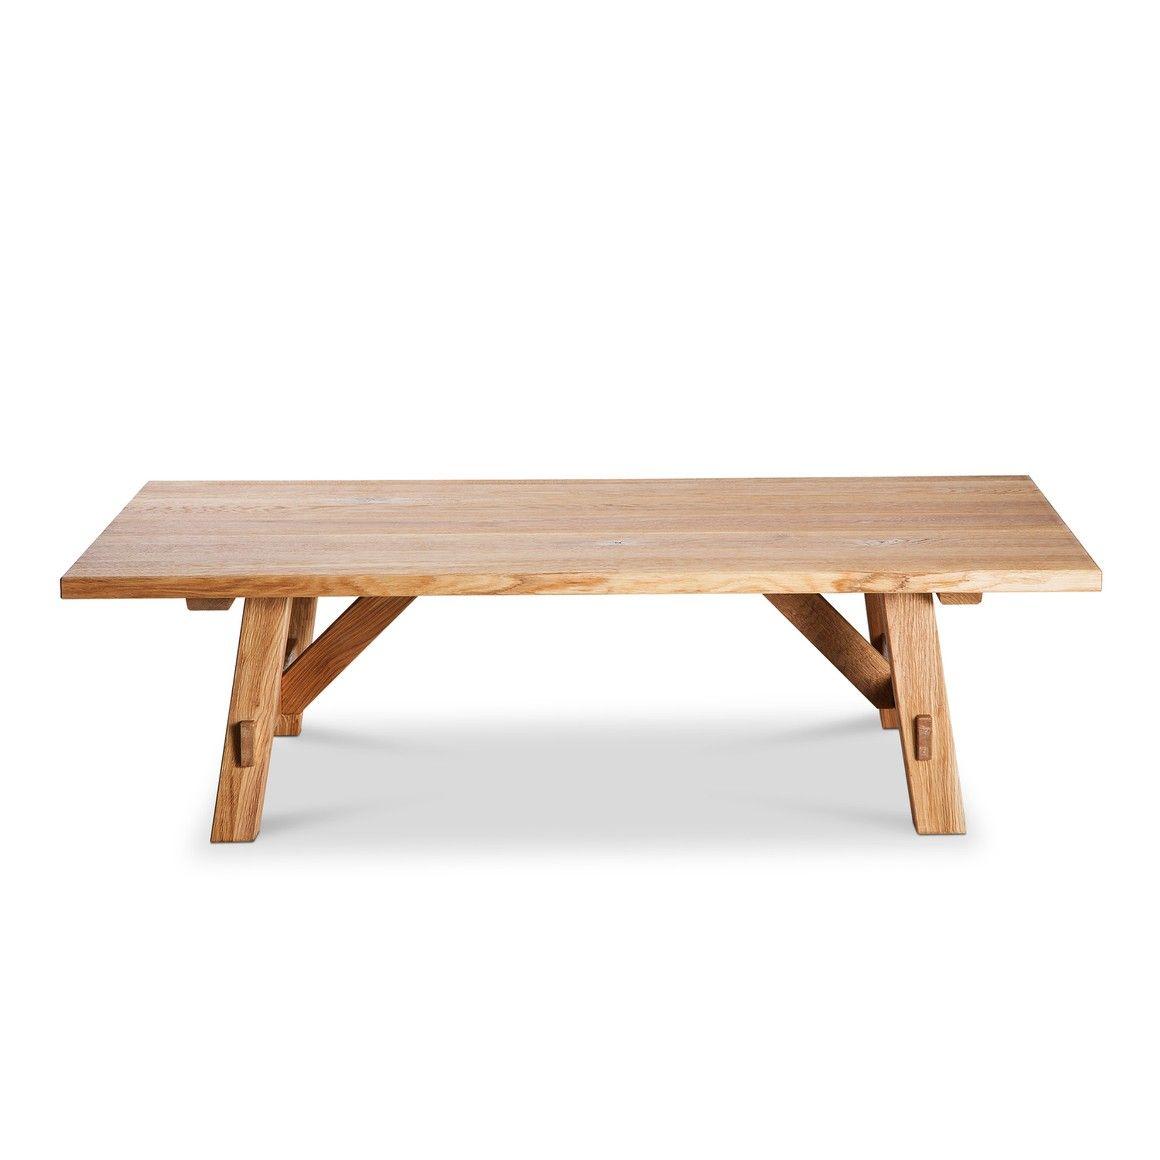 Table Basse Bois Massif Les Milles Chene Massif 16184400 0 Clubtisch Tisch Design